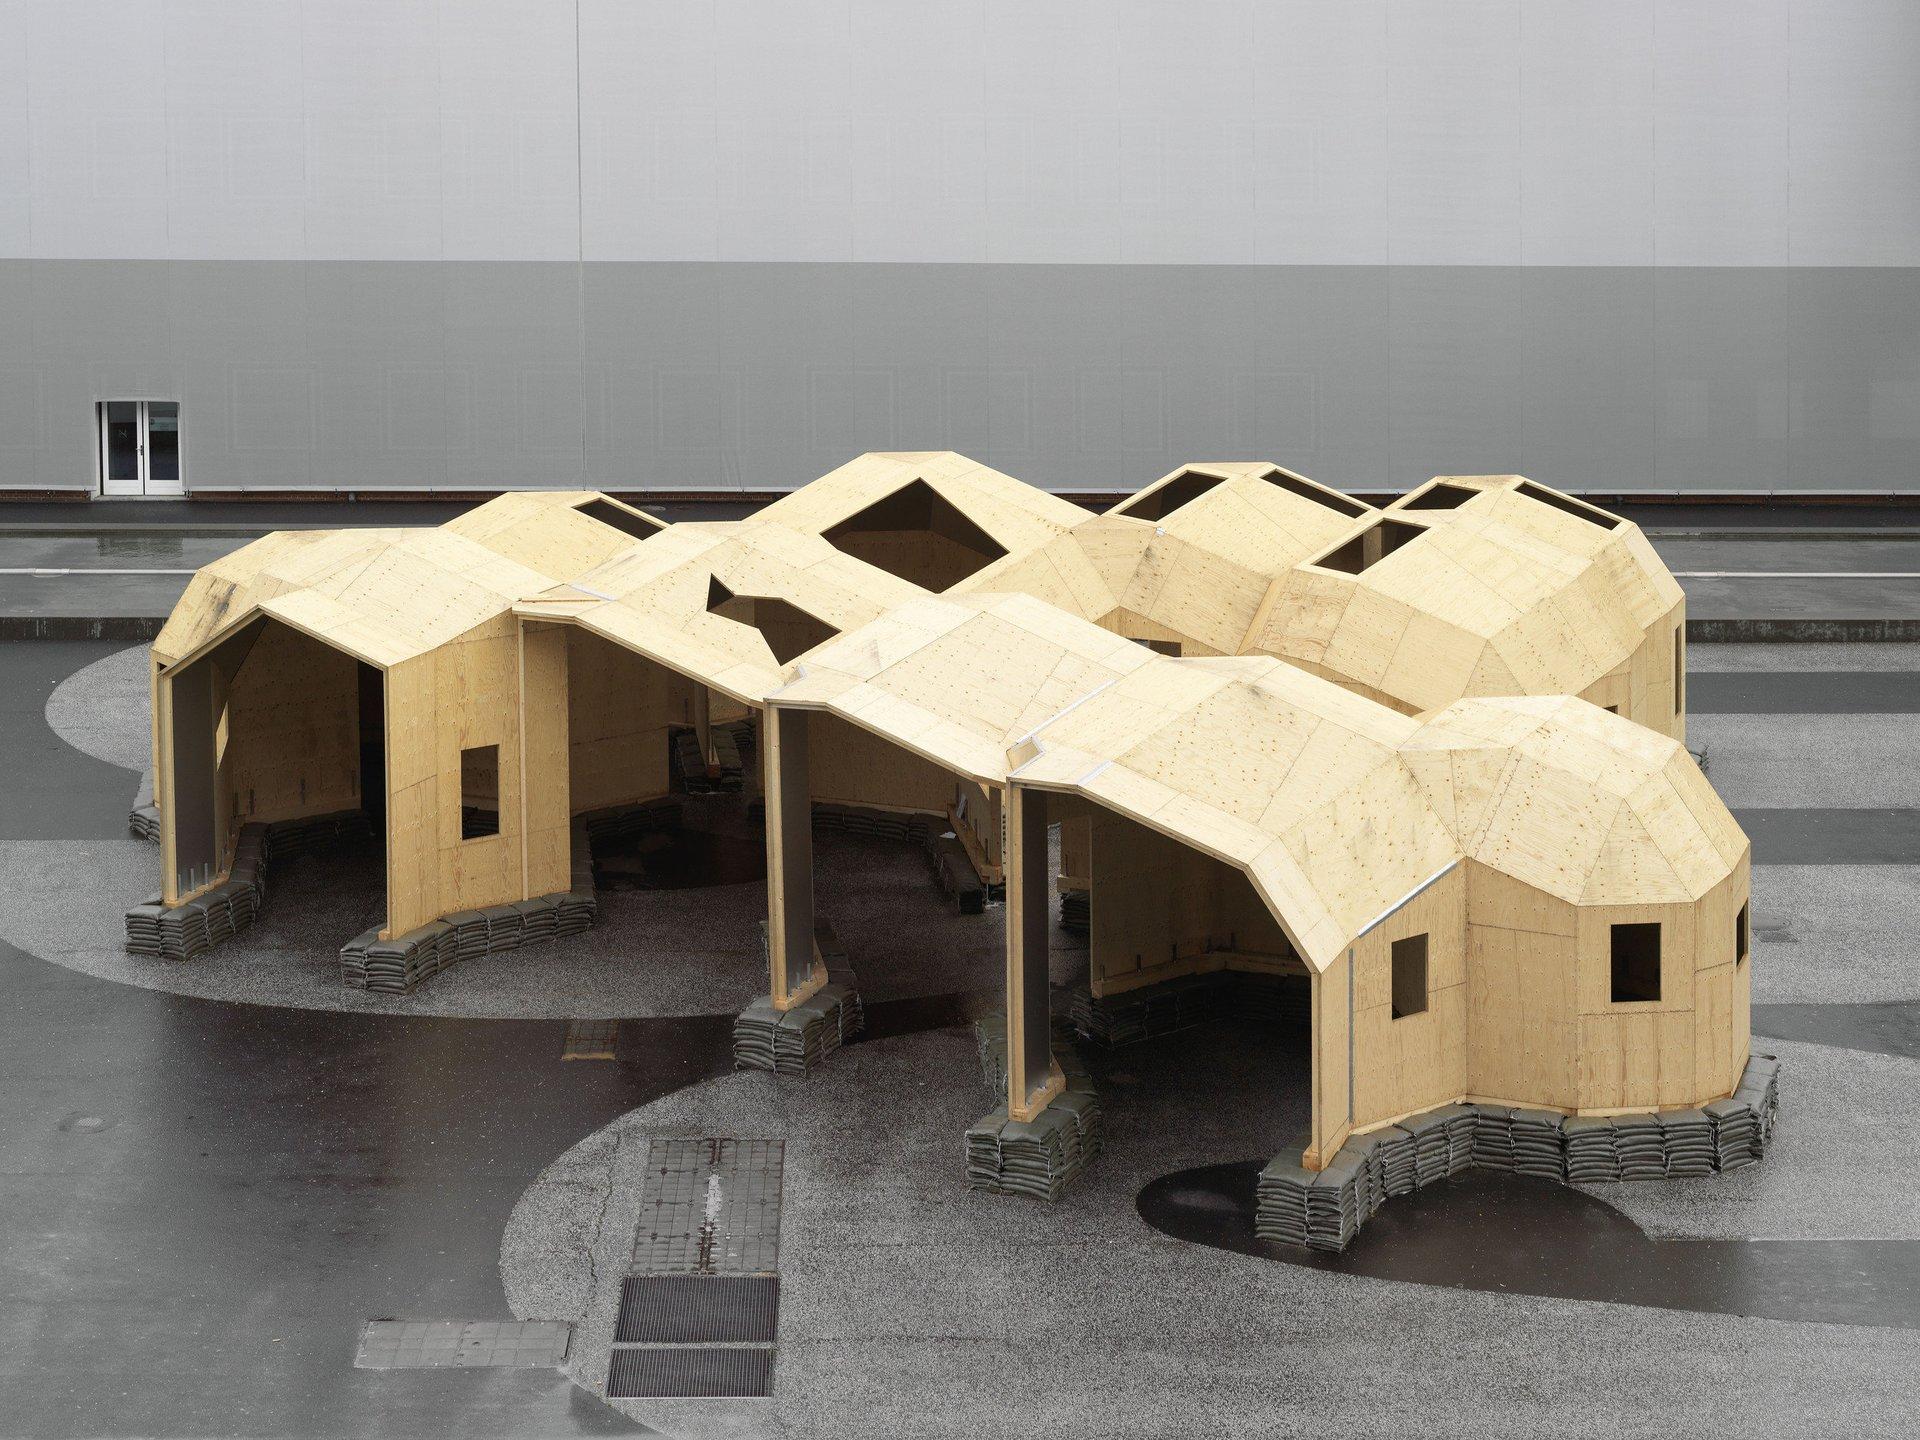 4-teiliges 3-dimensionales Holzkonstrukt von oben